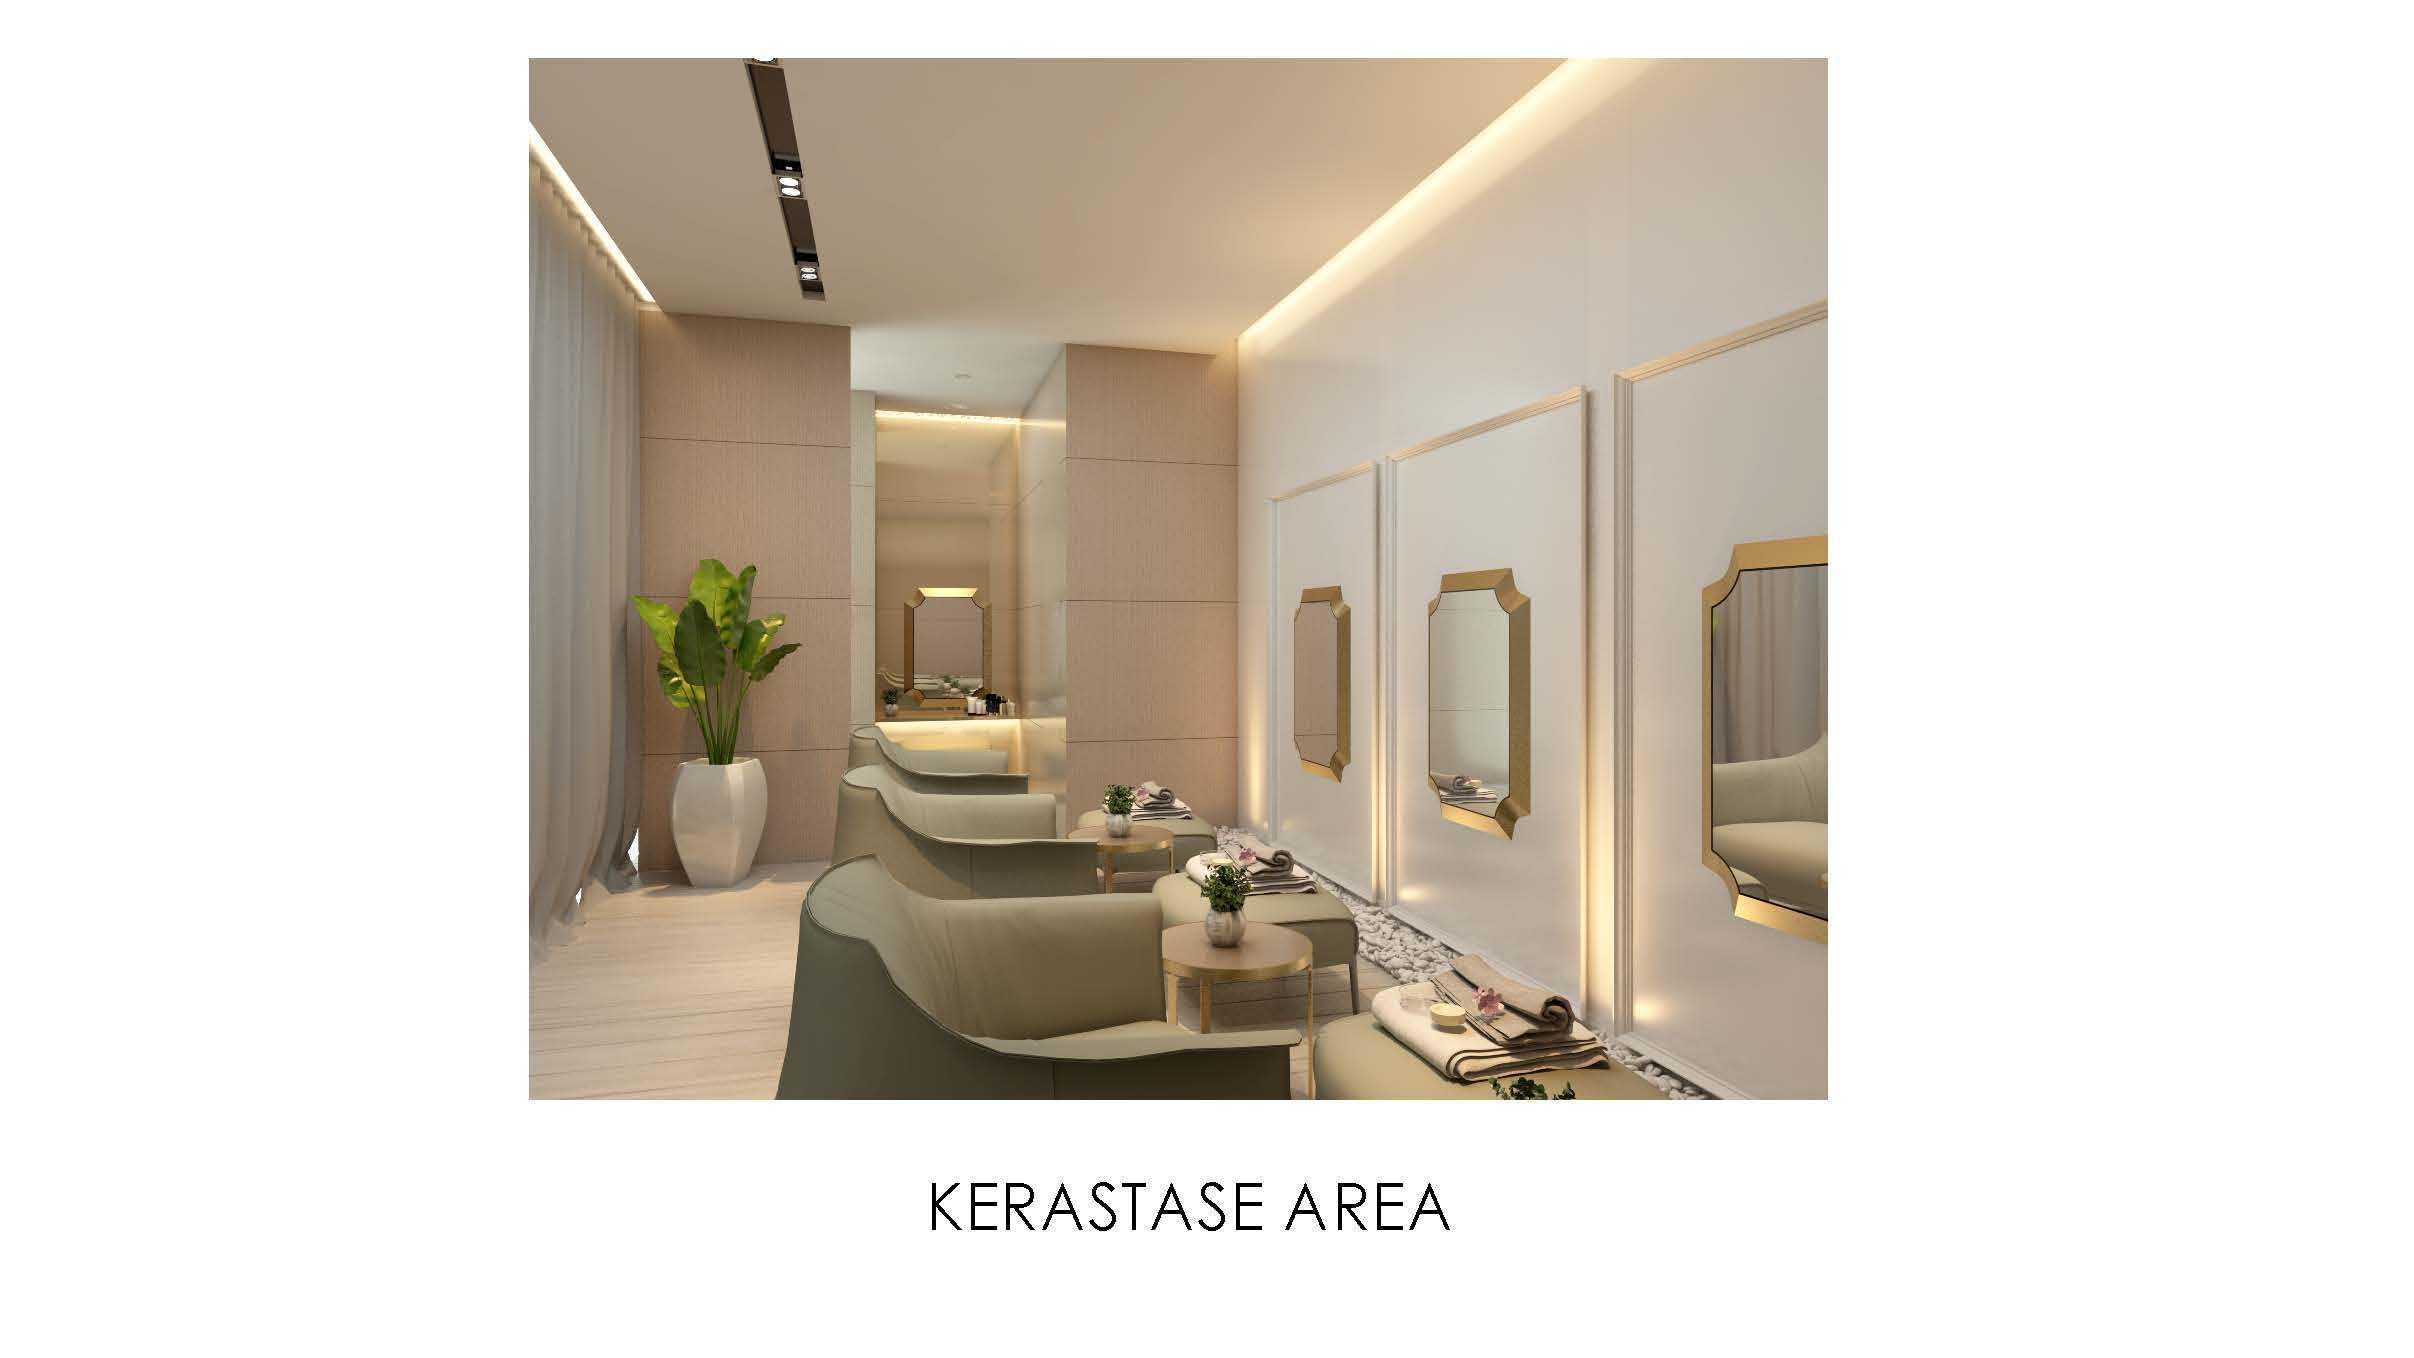 Menata Studio B+B Salon Jakarta, Daerah Khusus Ibukota Jakarta, Indonesia Jakarta, Daerah Khusus Ibukota Jakarta, Indonesia Menata-Studio-Bb-Salon   70837